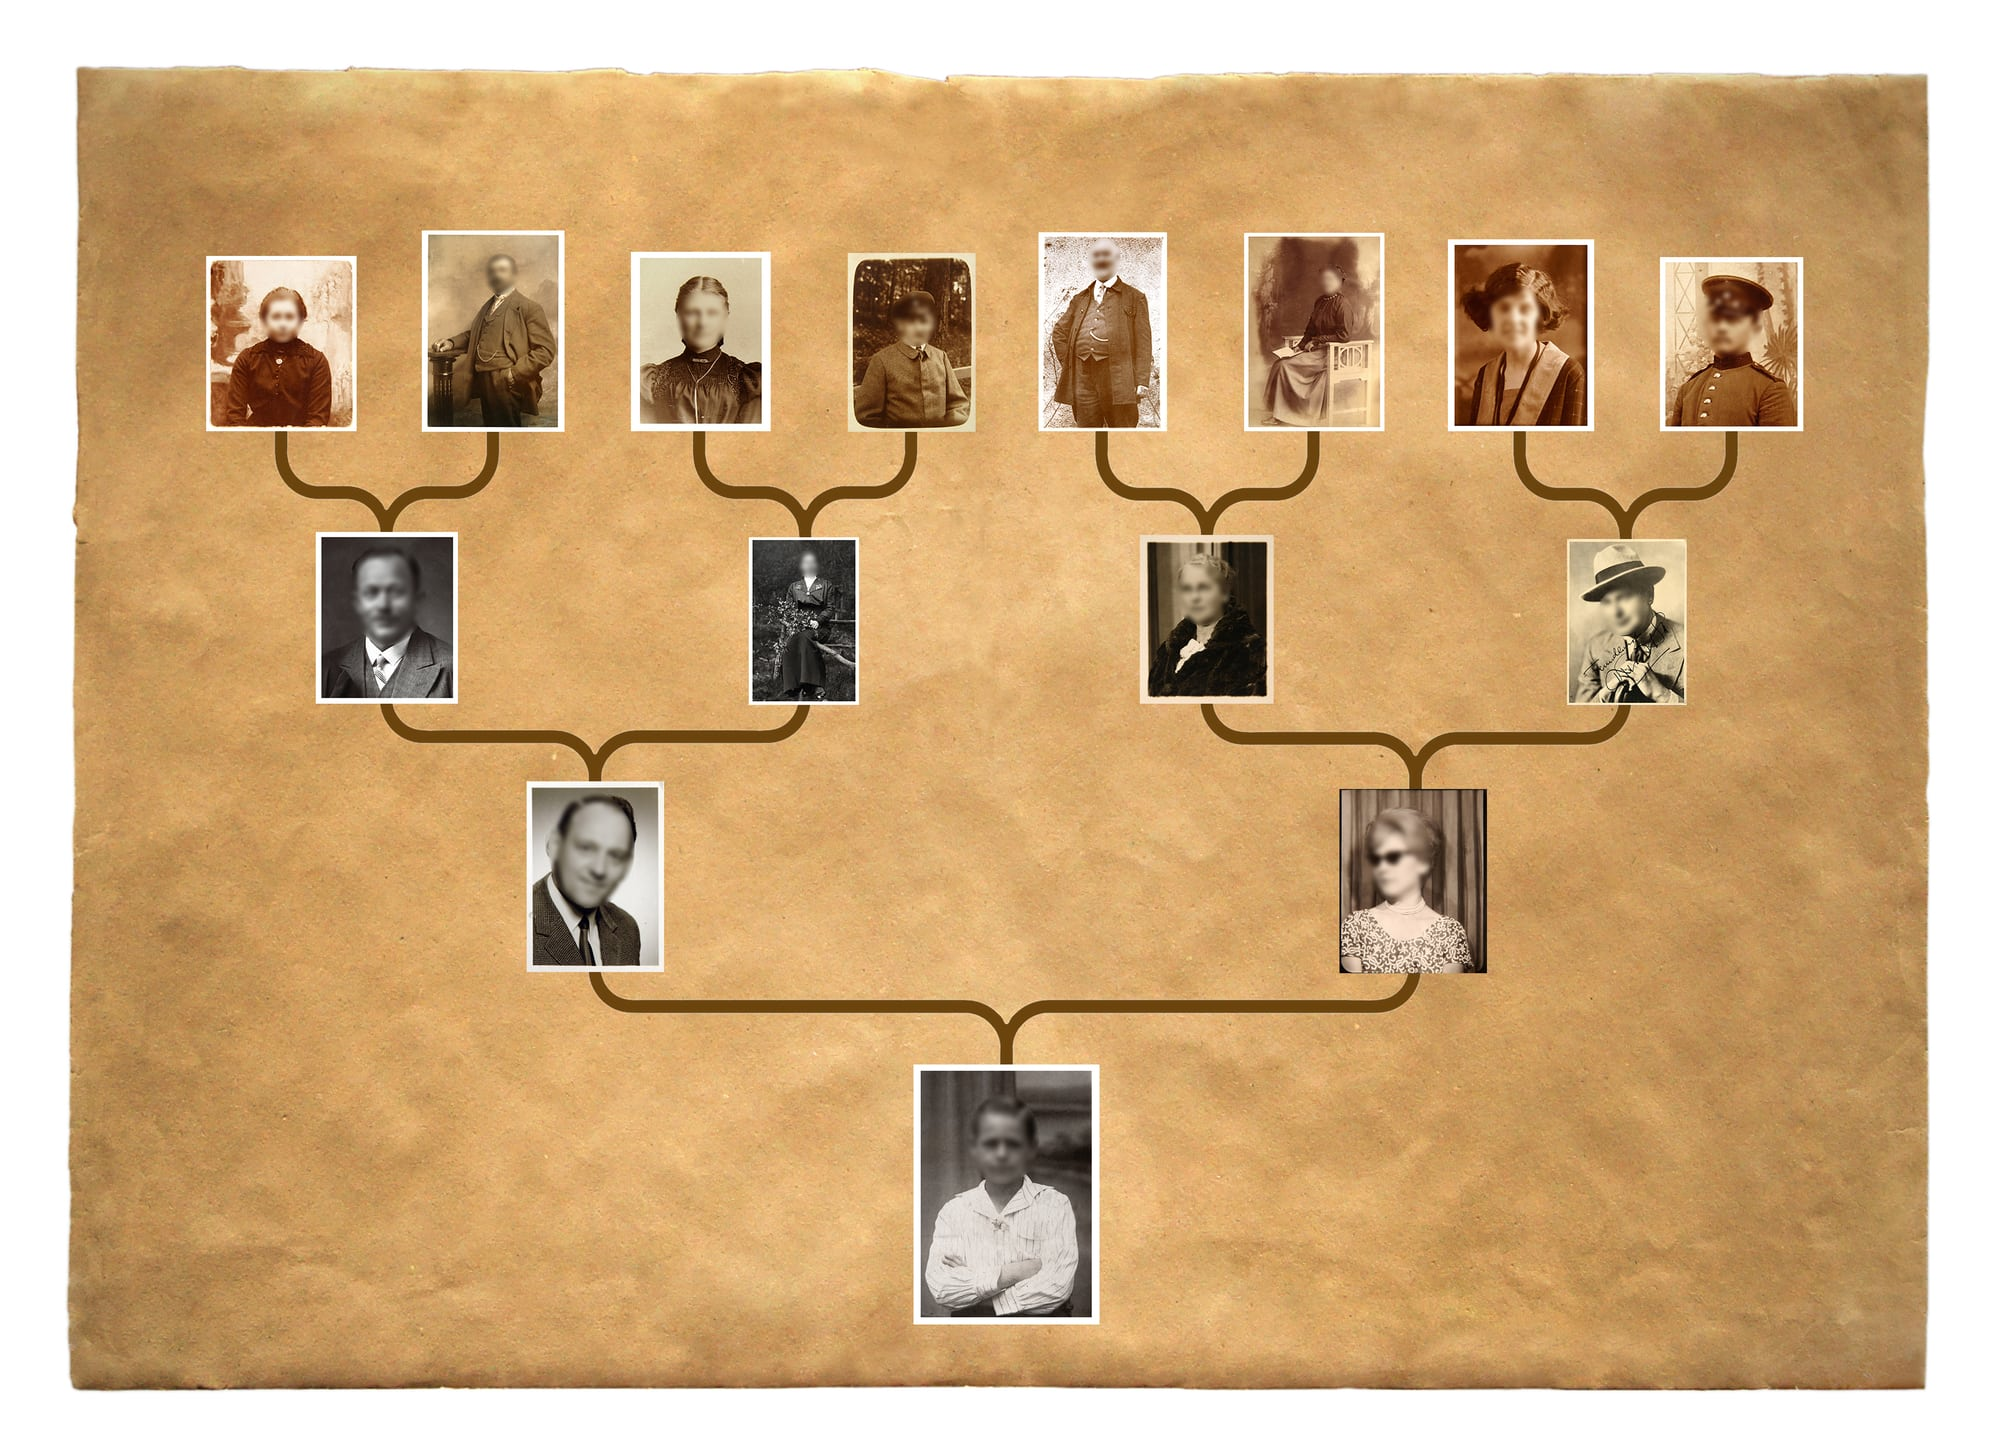 It's All Relative - Basic Genealogy